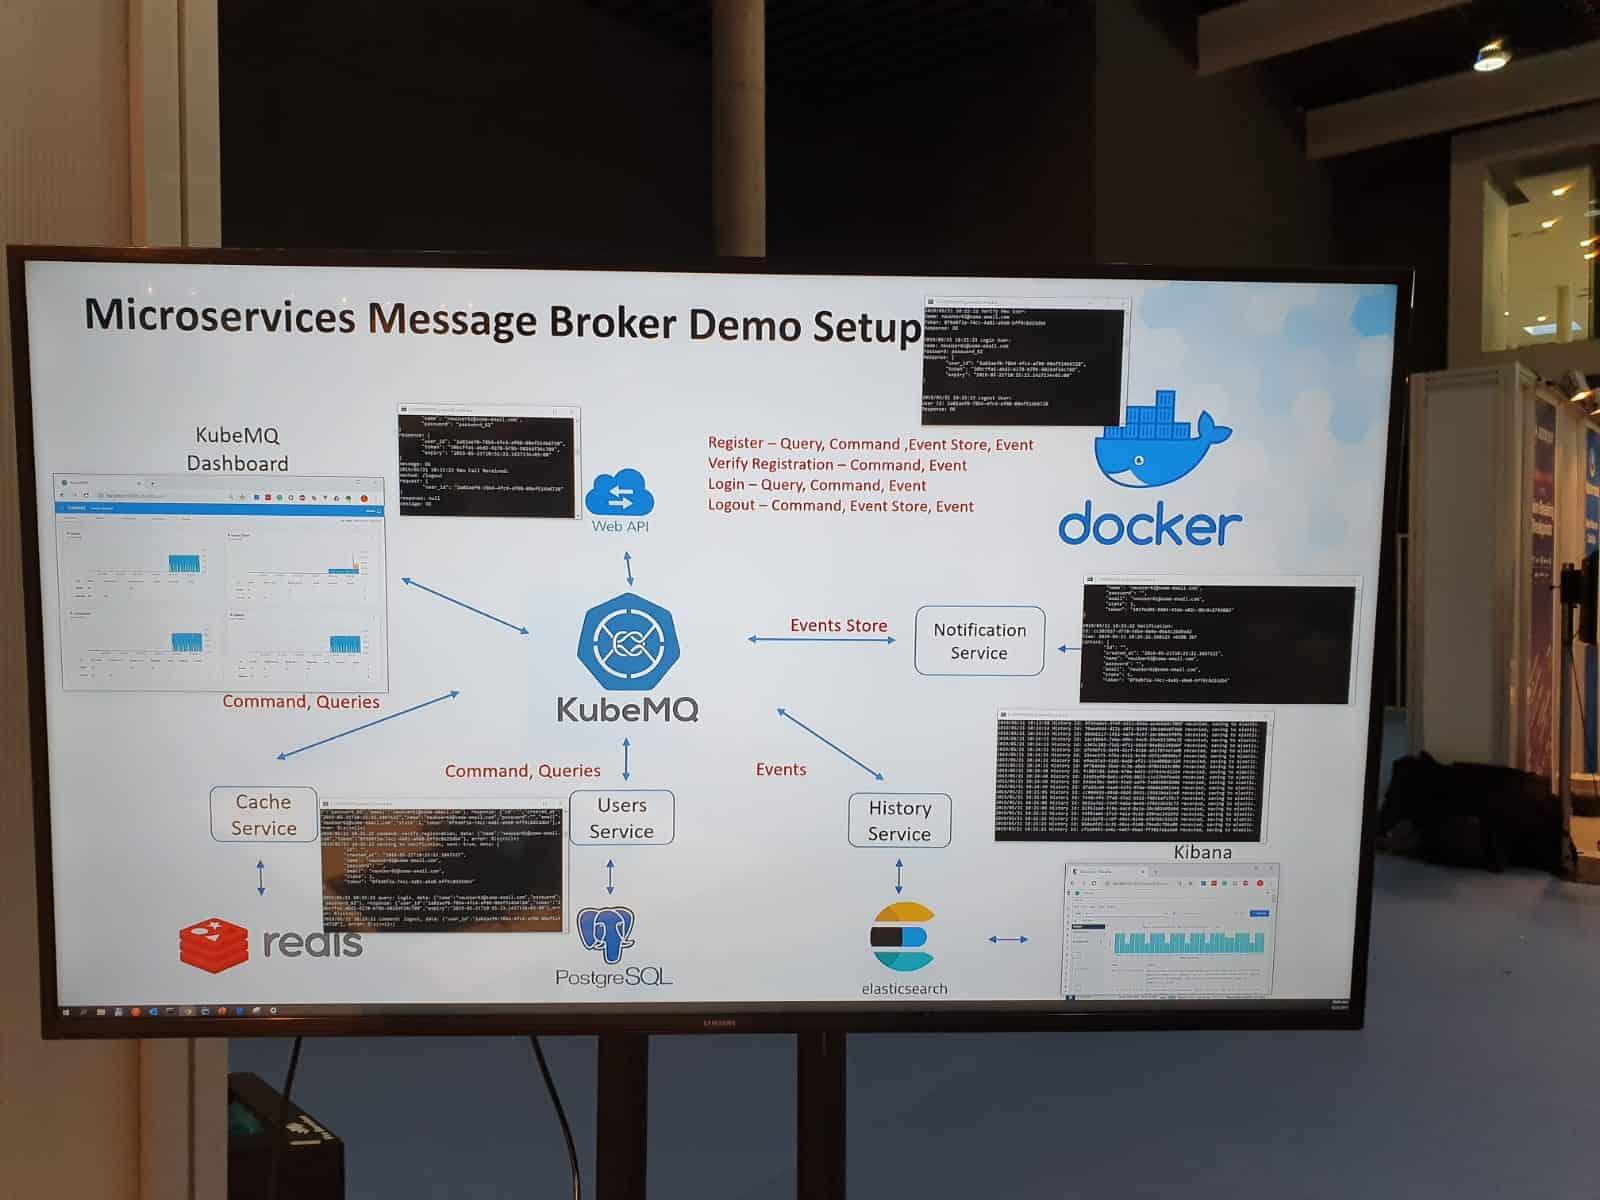 Microservices message broker demo setup